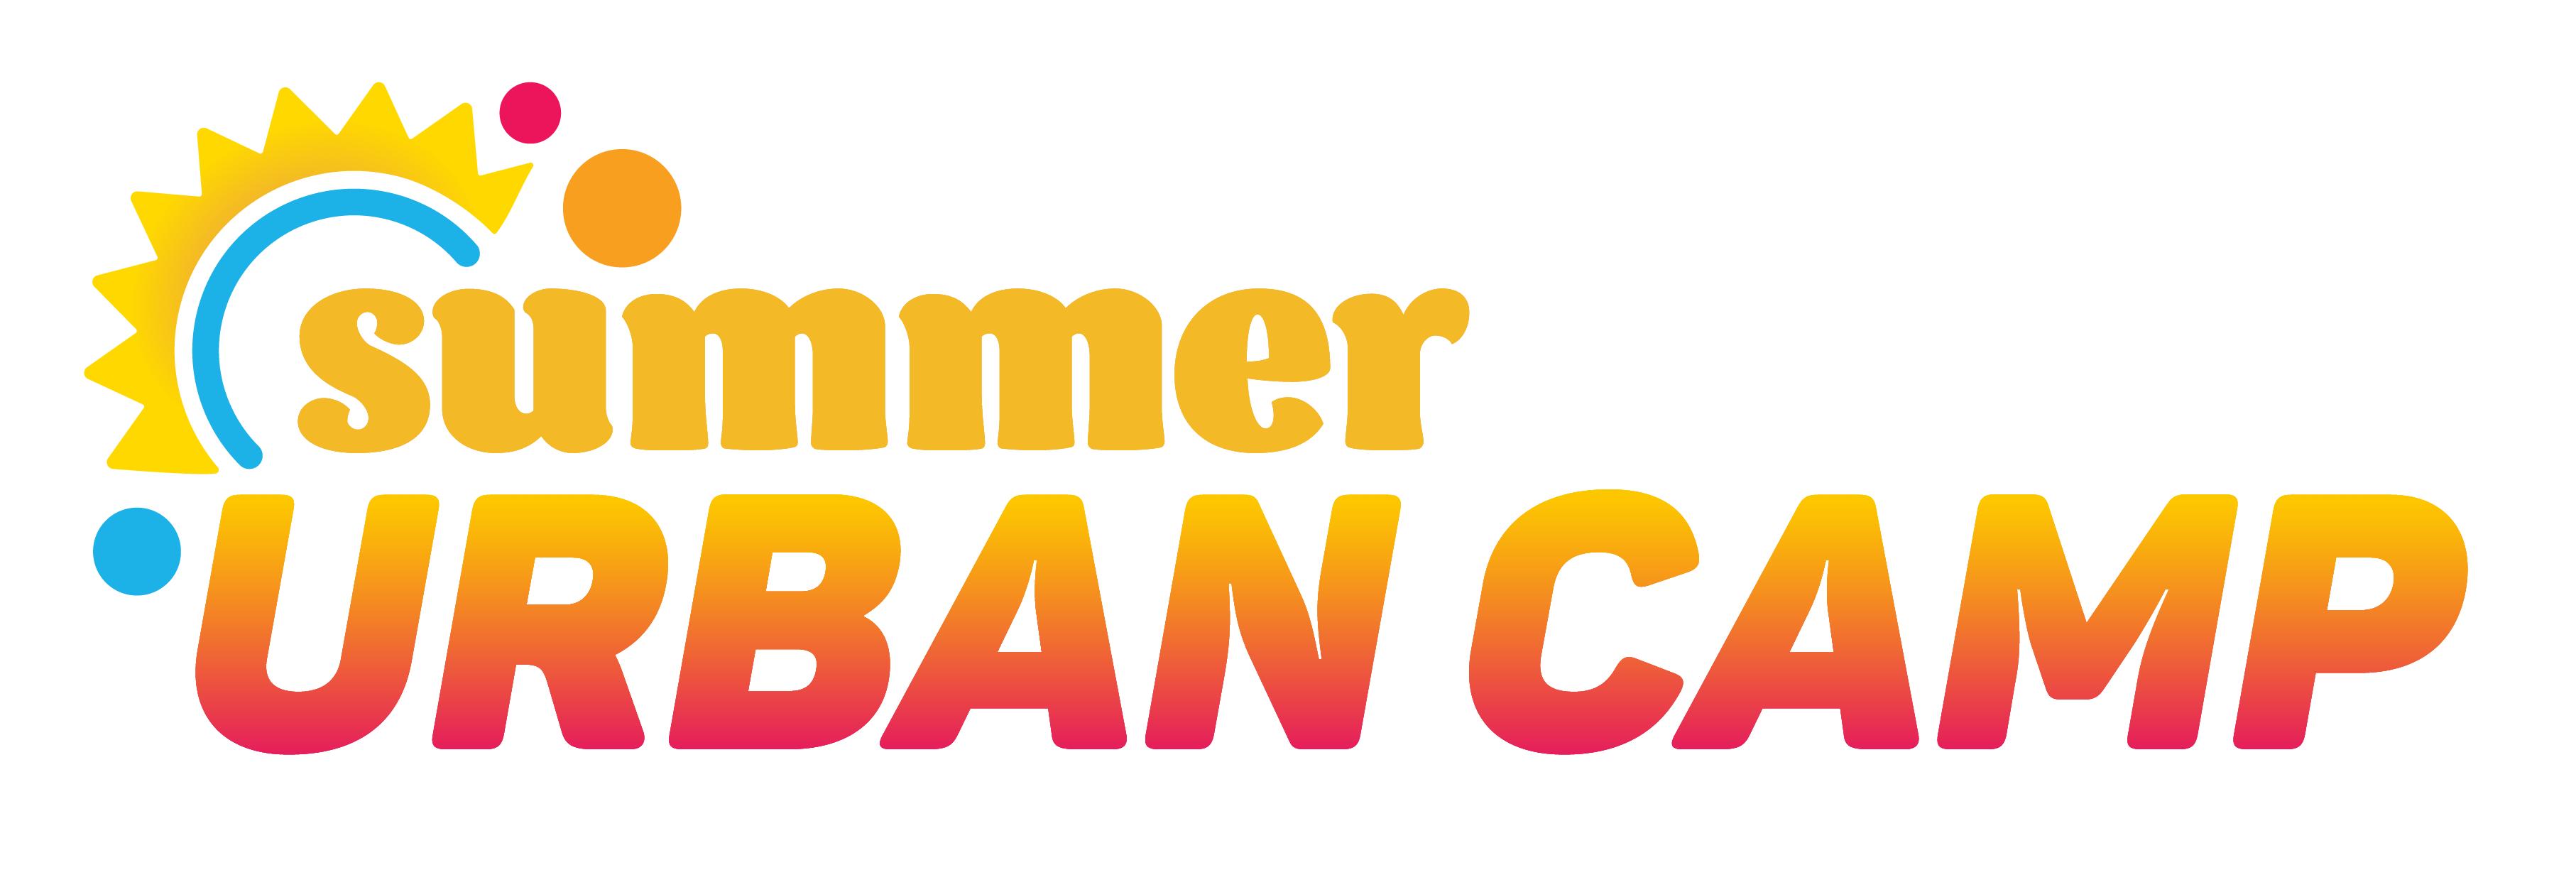 summer urban camp